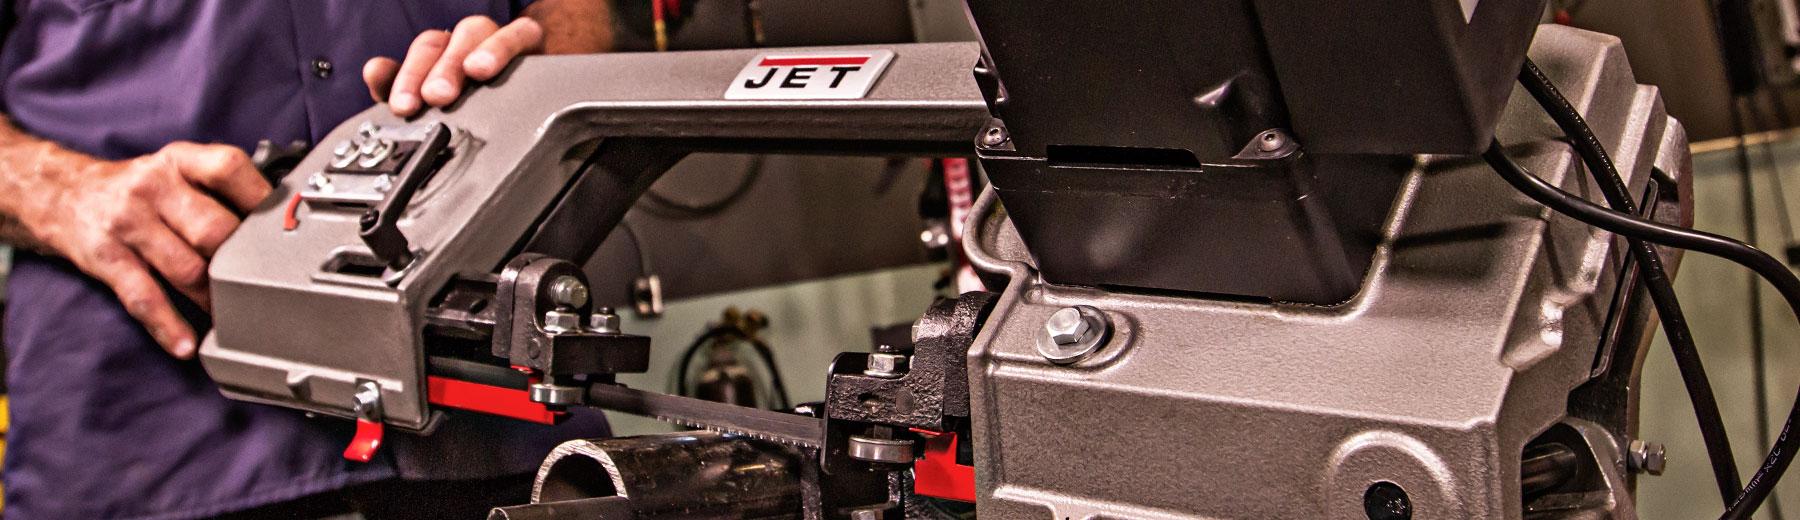 Jet 16 Planer Manual